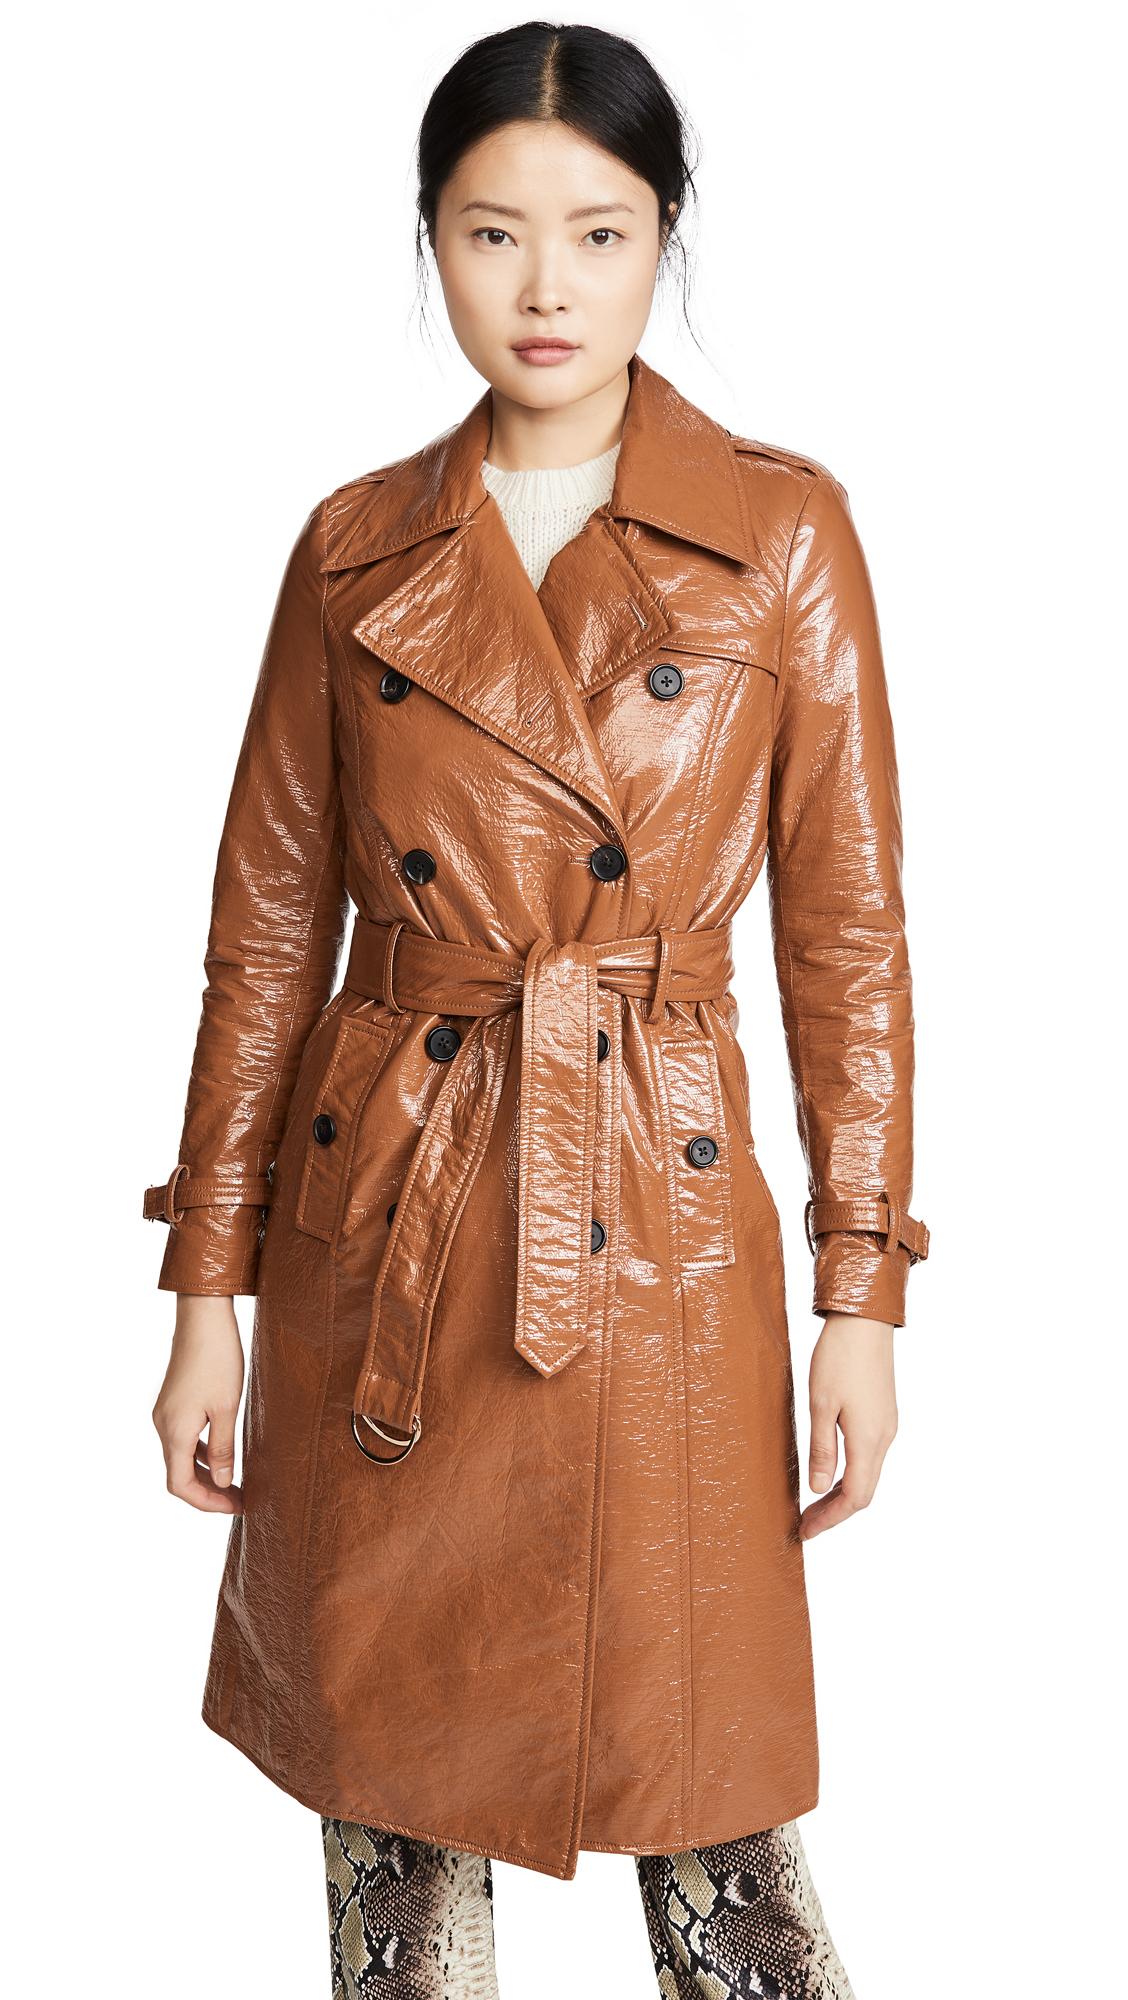 Buy Veronica Beard Finnick Dickey Trench Coat online beautiful Veronica Beard Jackets, Coats, Trench Coats